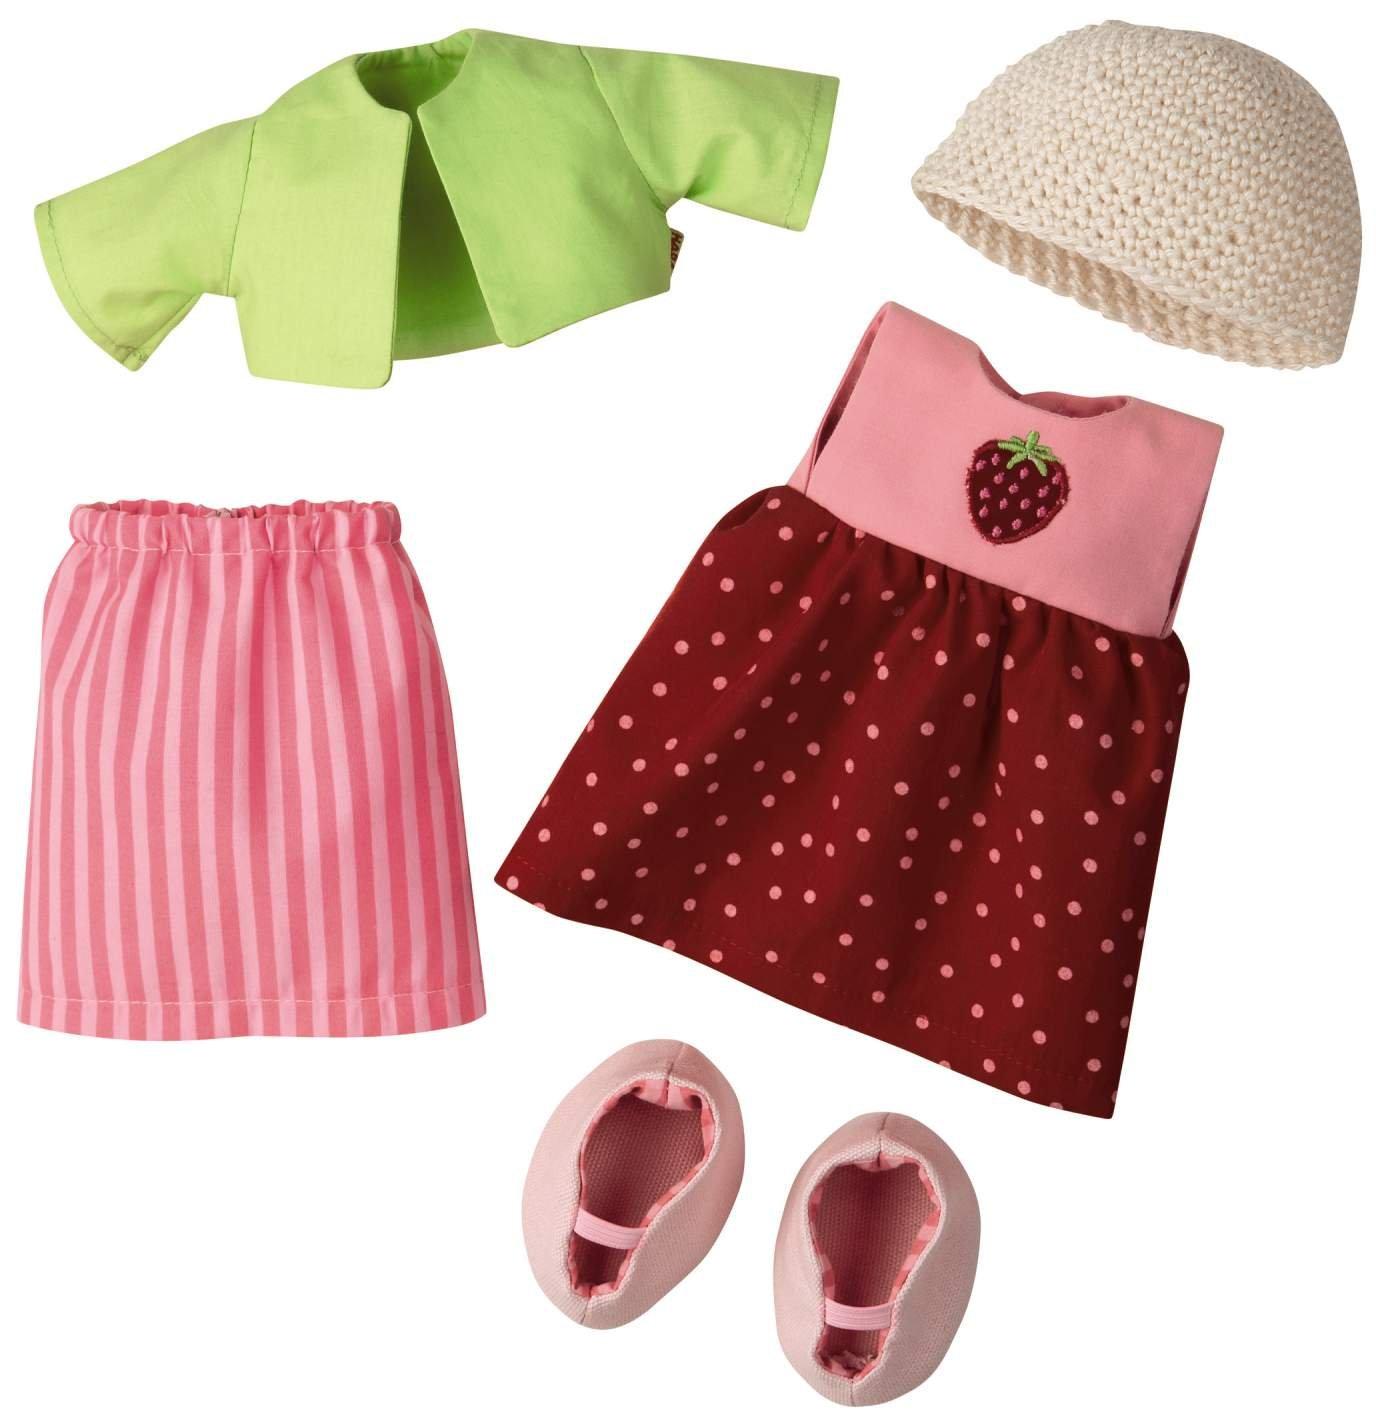 3669 – HABA – Kleiderset Erdbeere, 30cm günstig